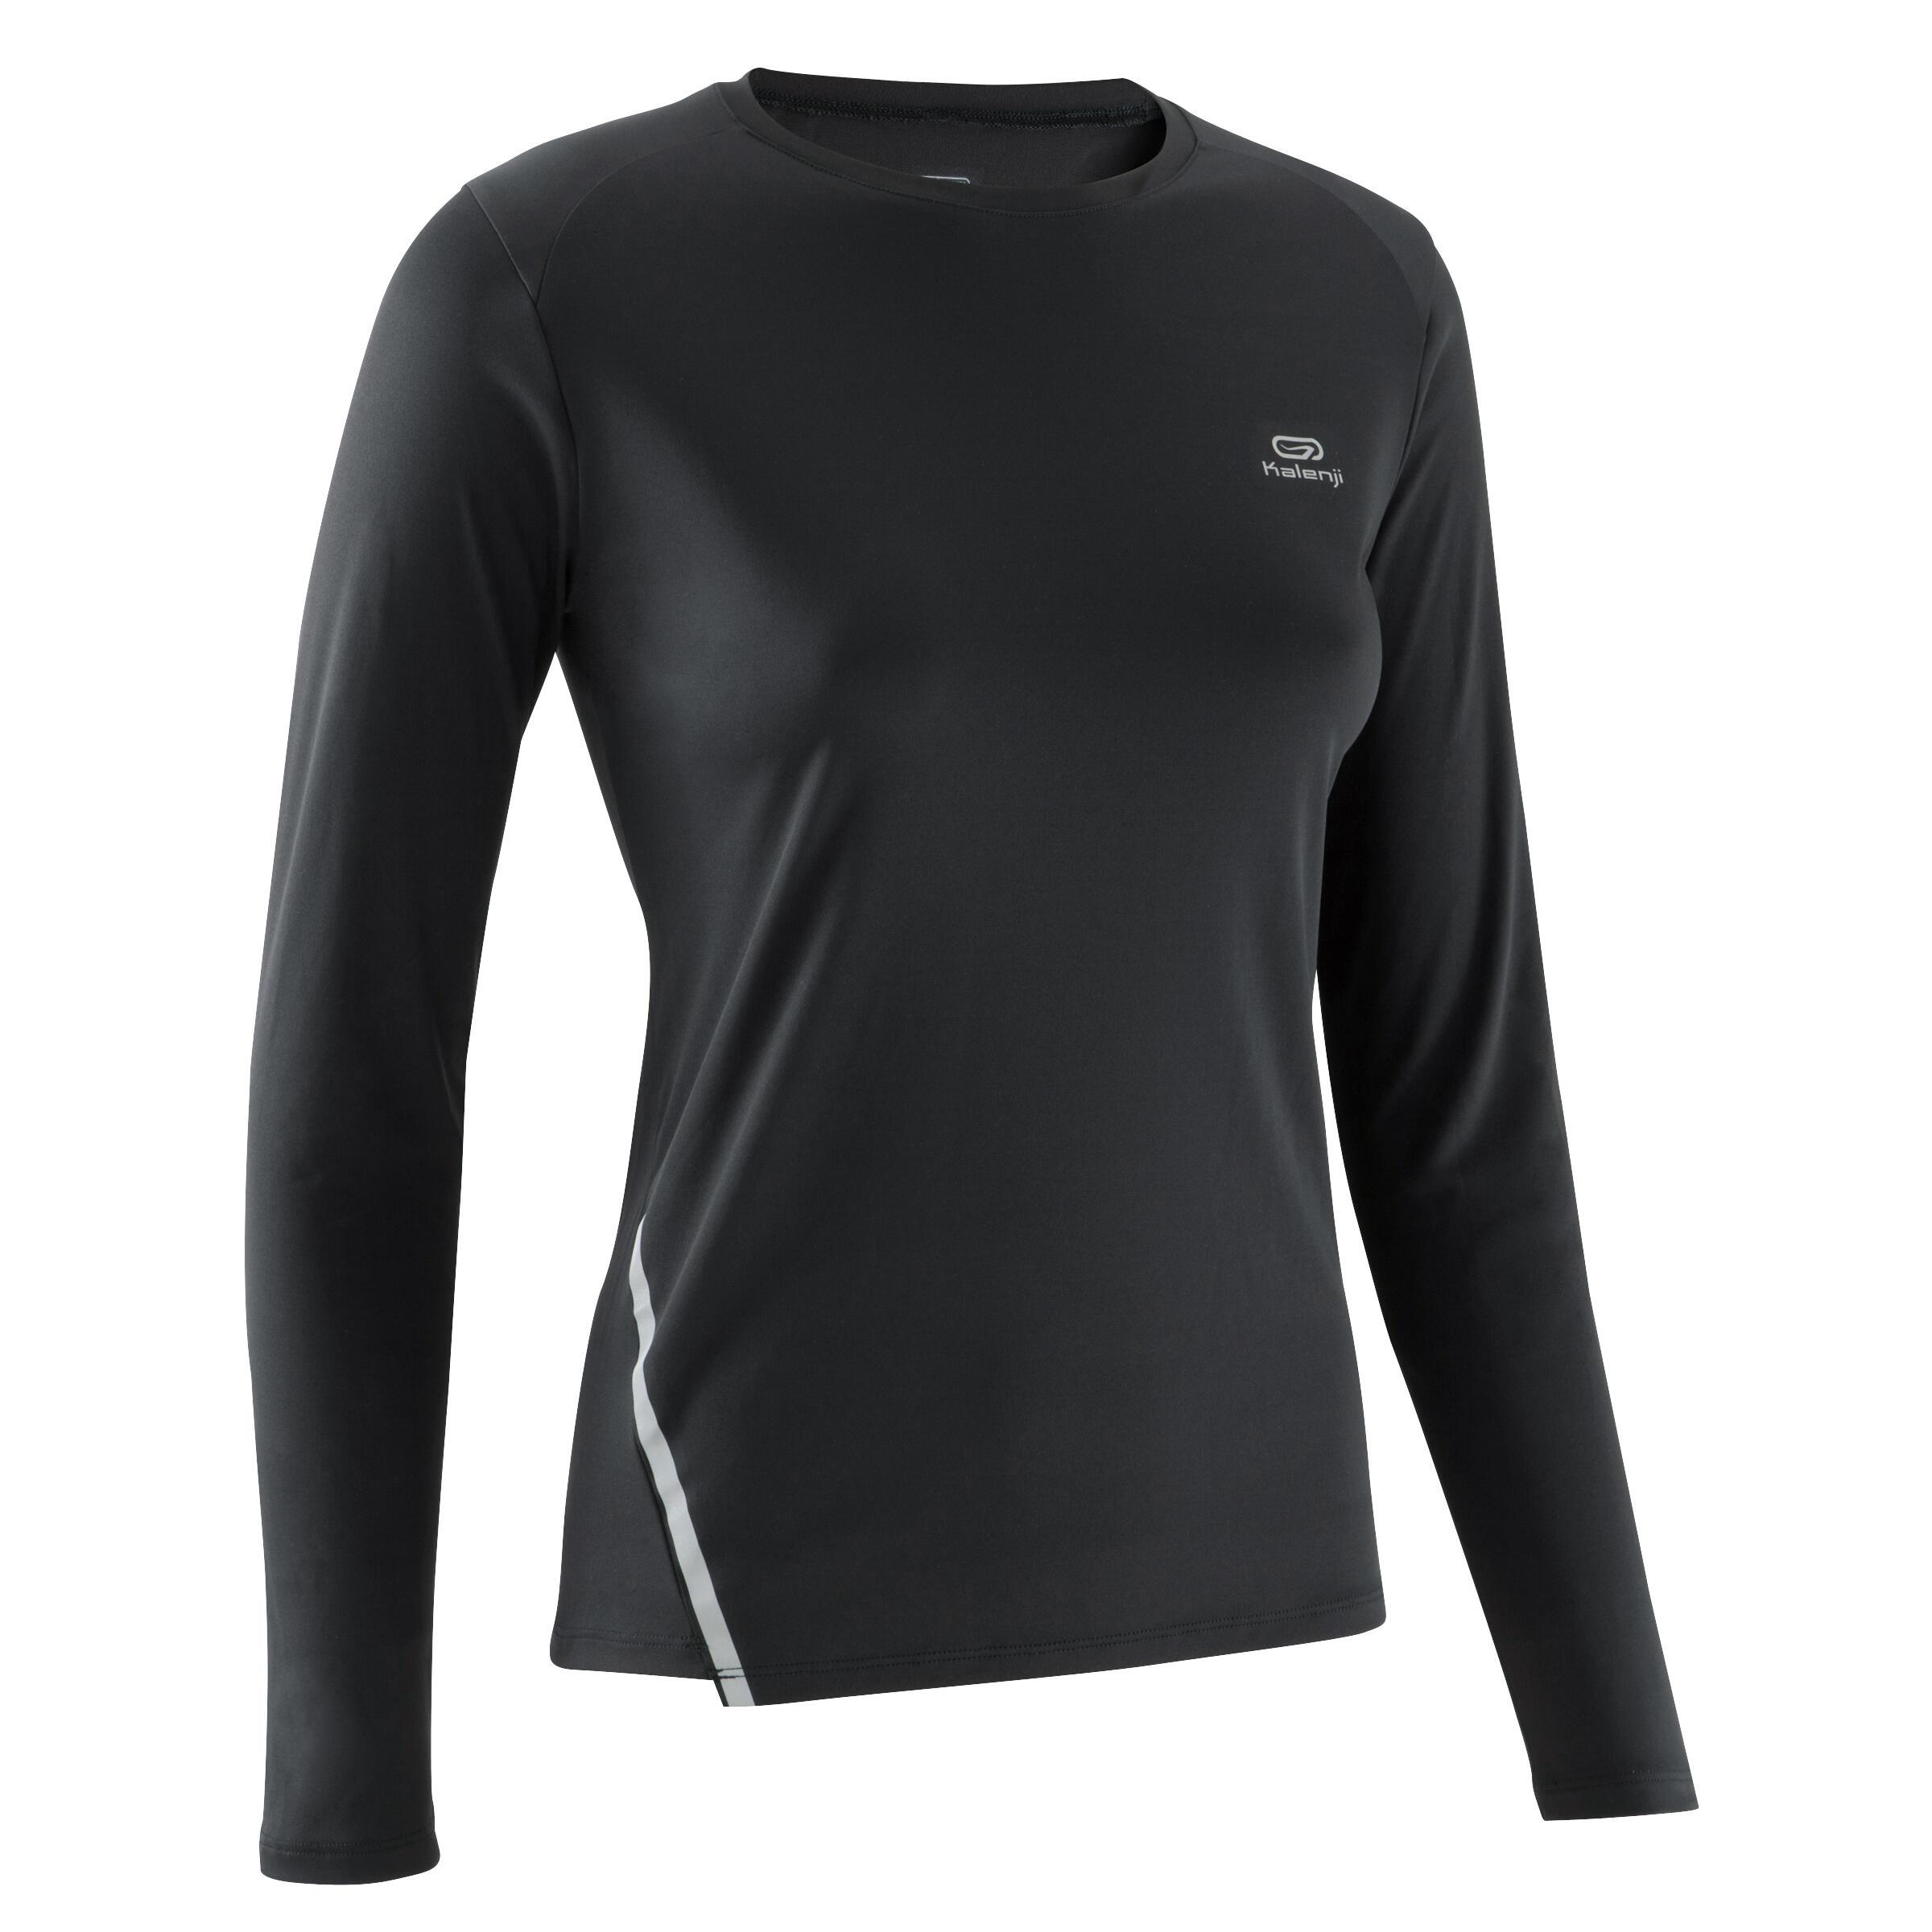 Run Sun Protect Women's Running Long-Sleeved T-Shirt - Black